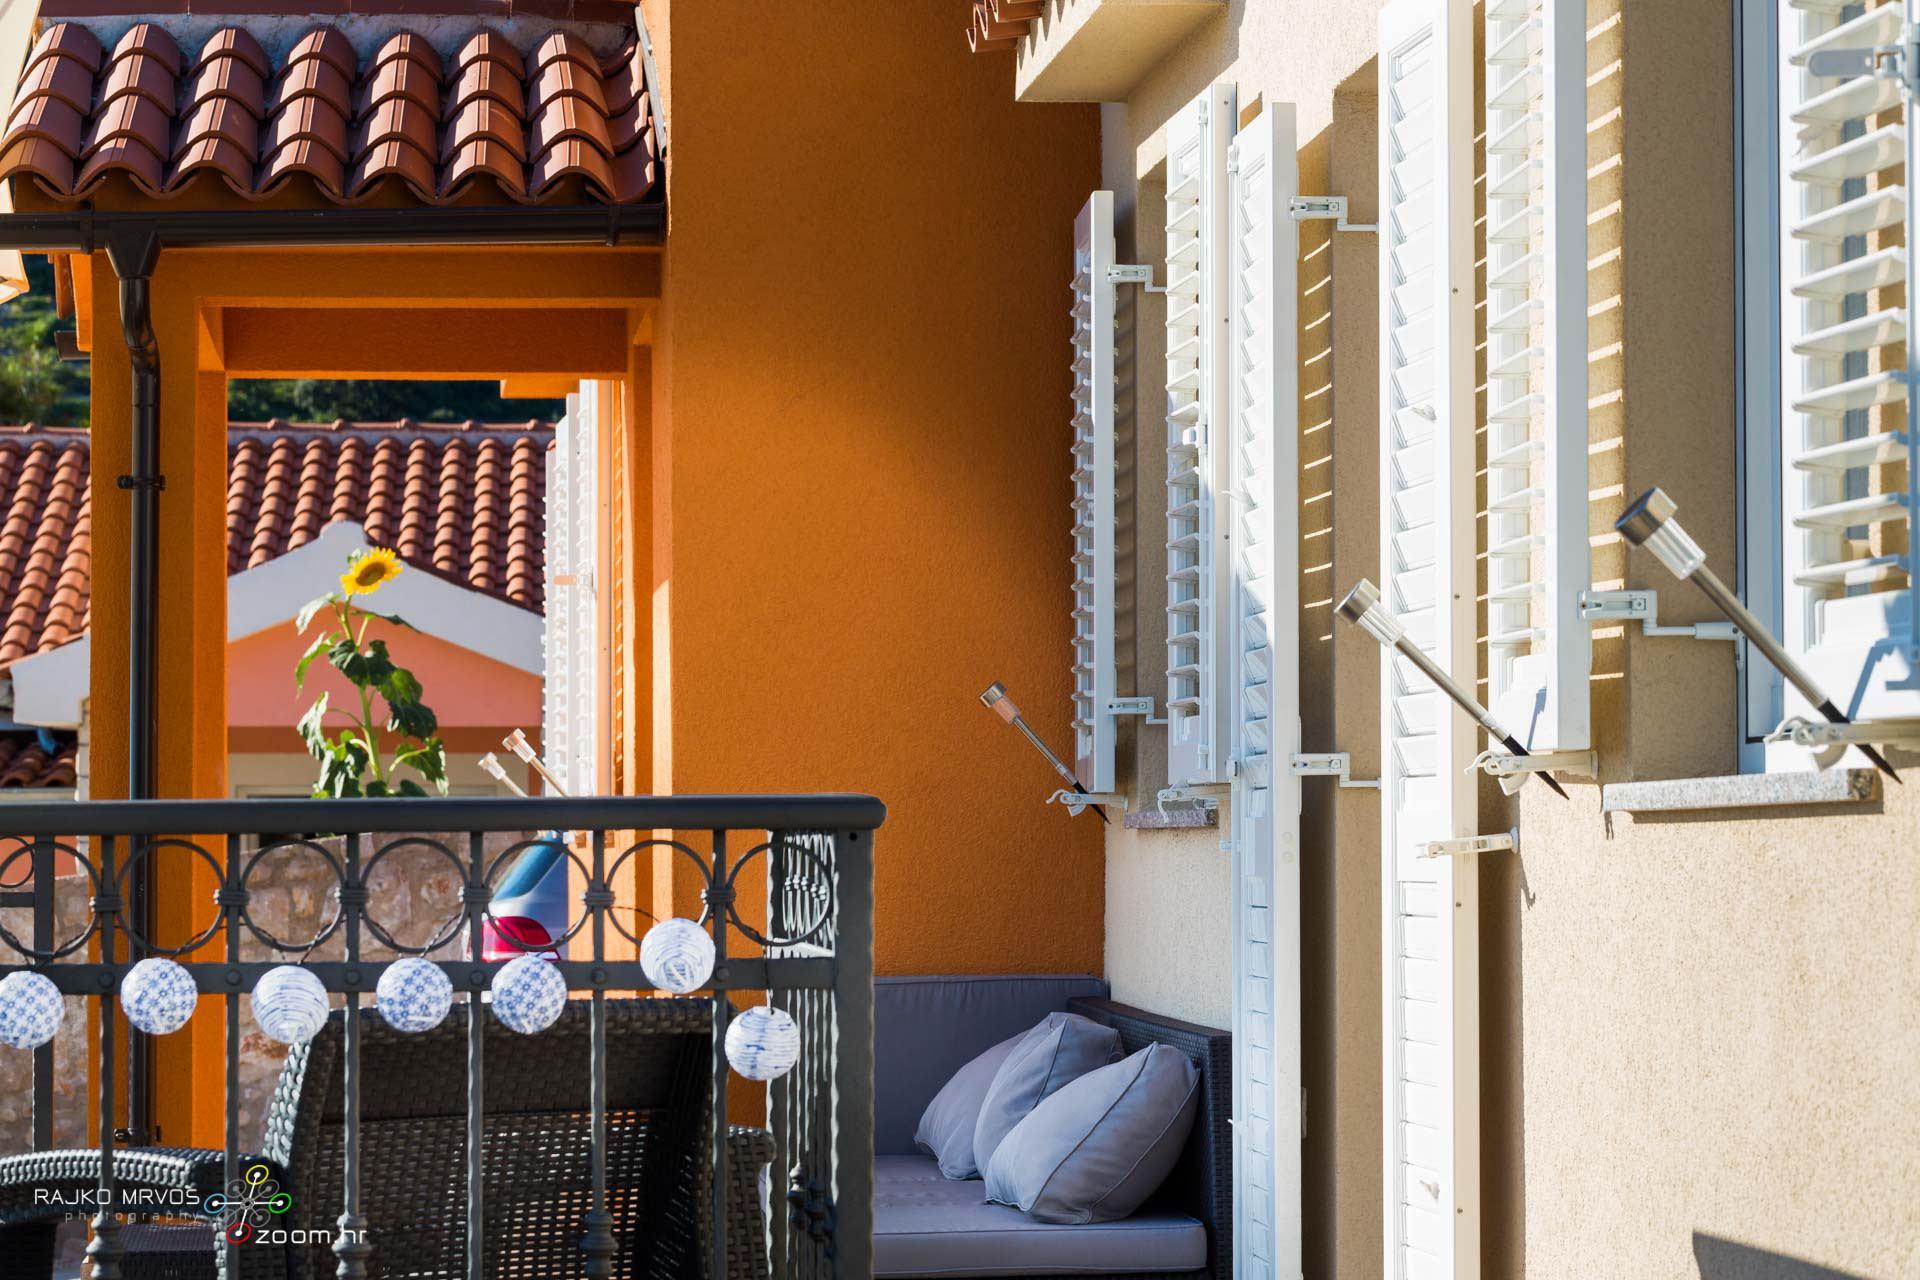 fotografiranje-kuca-fotograf-apartmana-vila-kuca-za-odmor-Hacienda-Babina-21